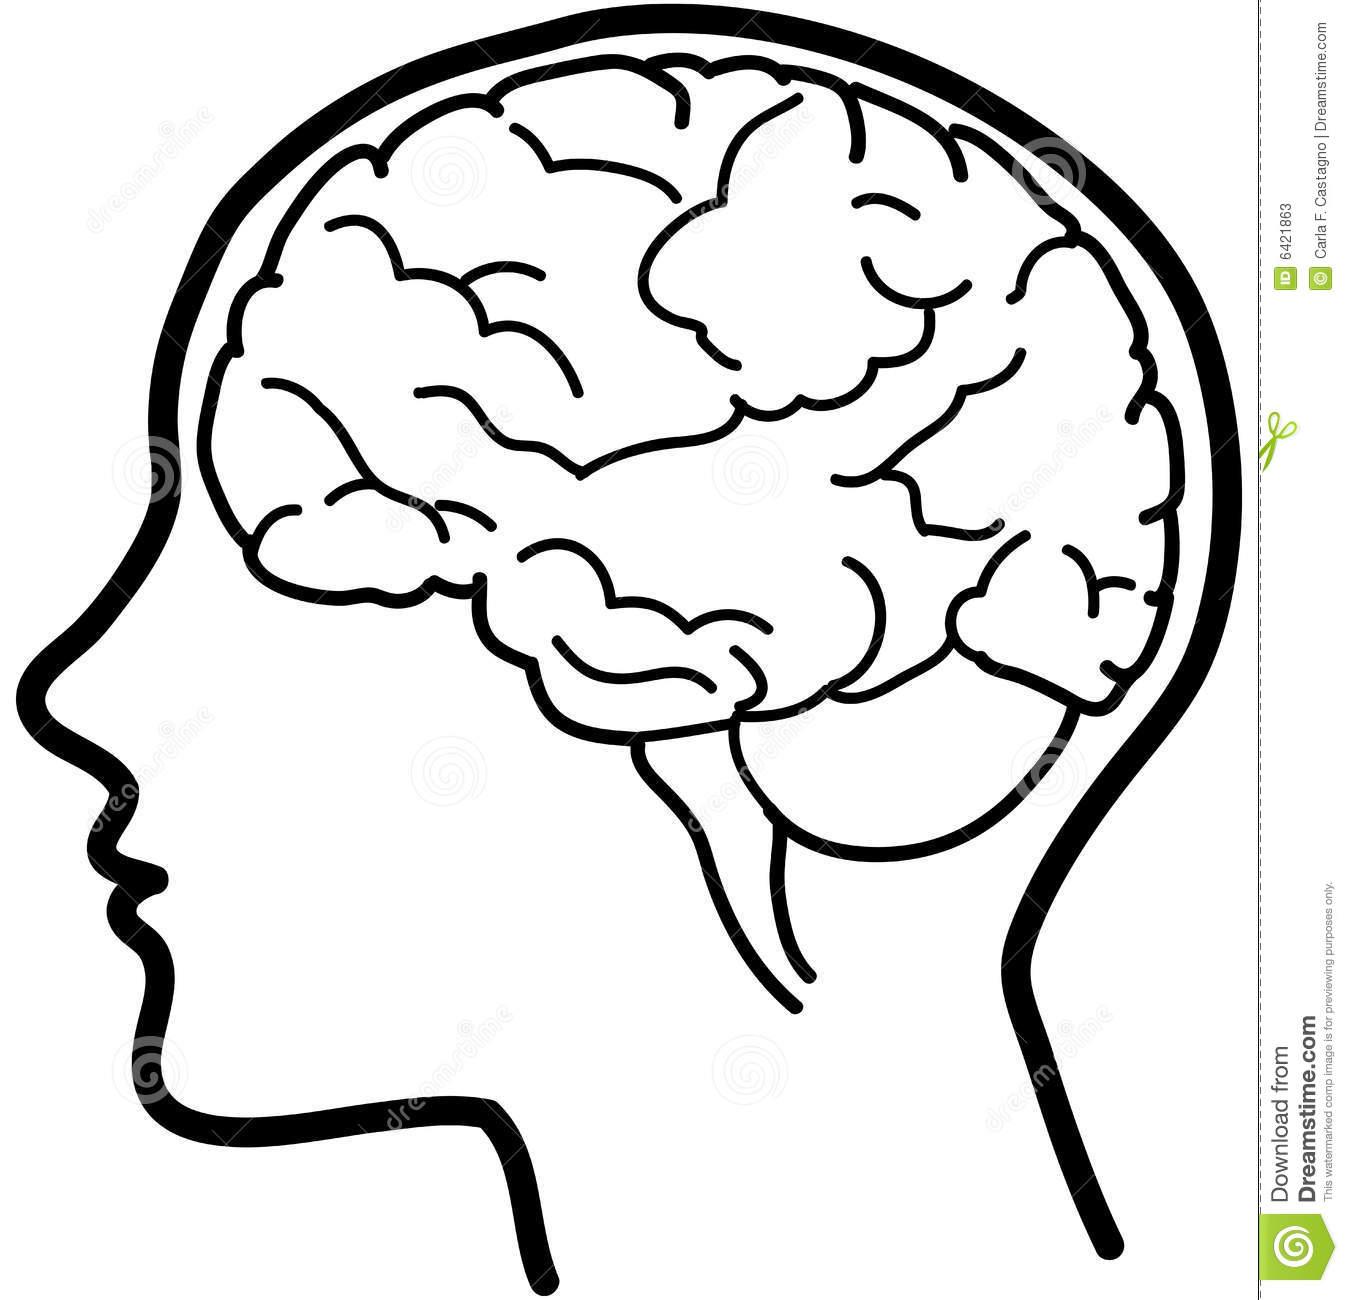 Drawn brains clipart background Clipart Mind Mind clipart clipart